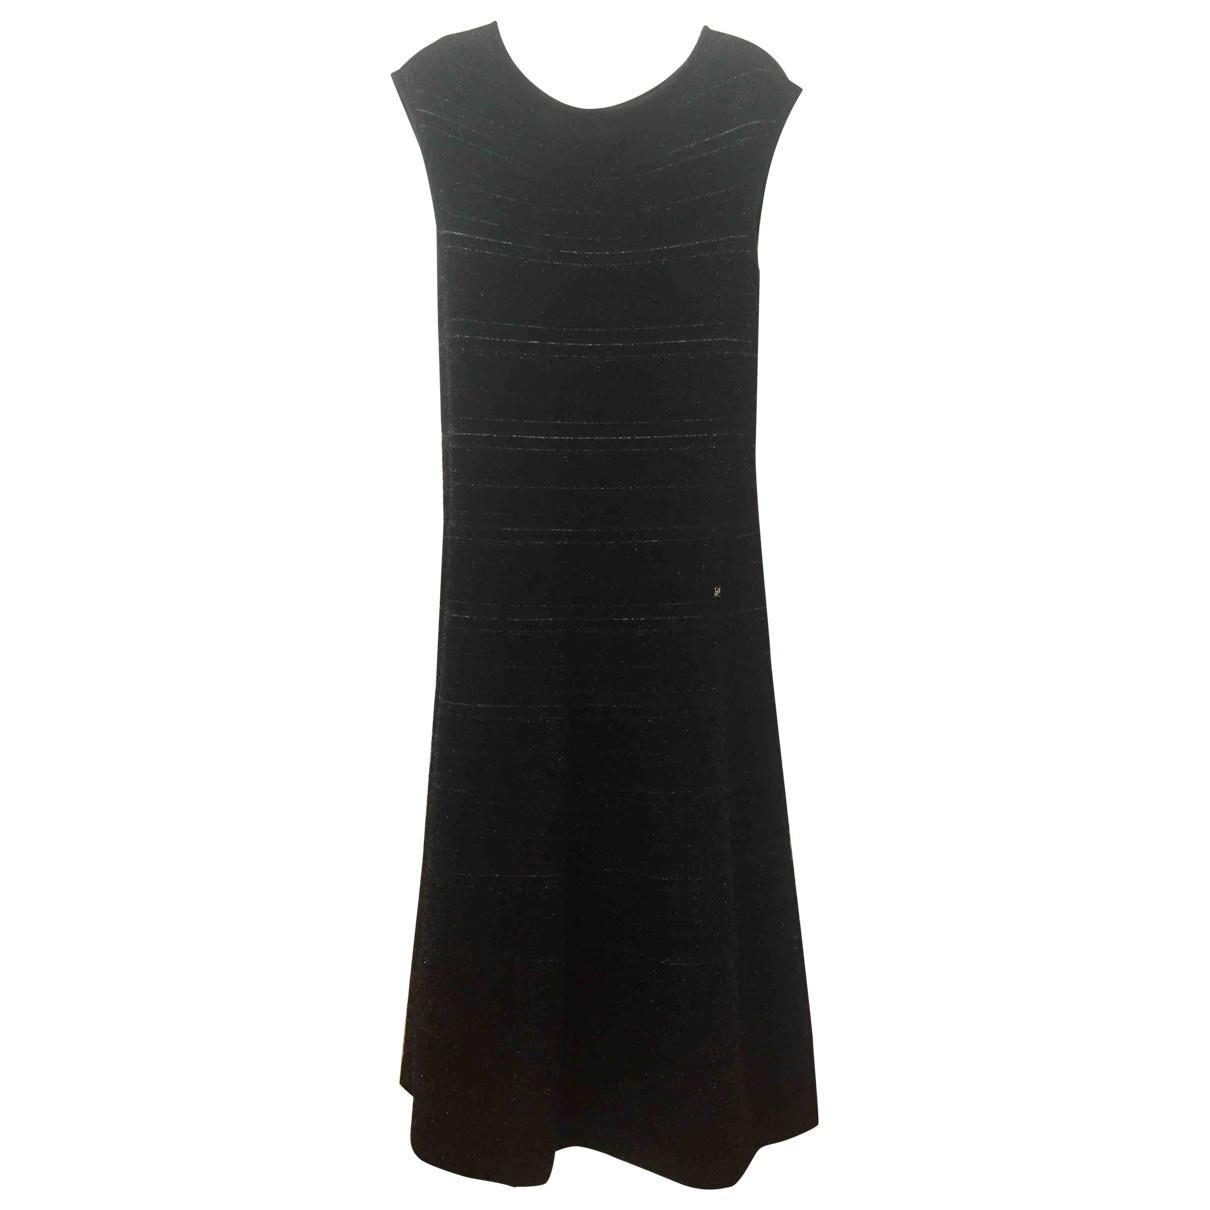 Carolina Herrera \N Kleid in  Schwarz Synthetik